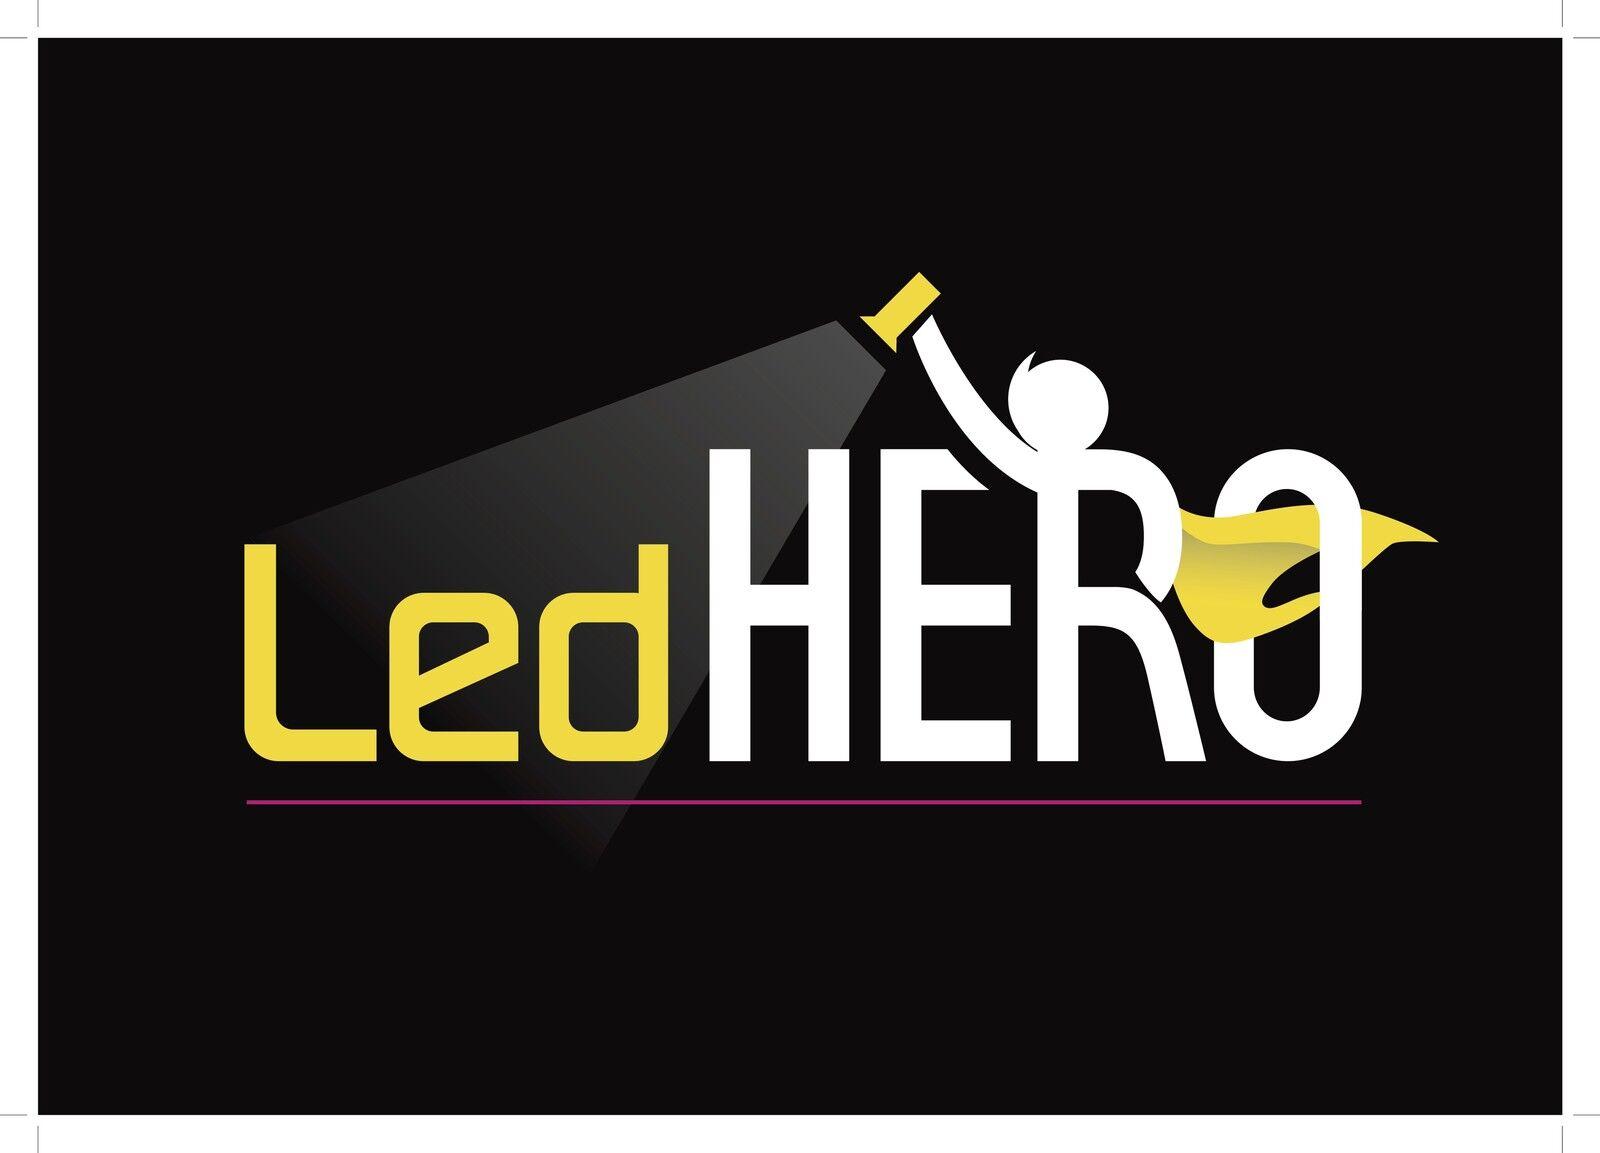 LEDHERO.LTD